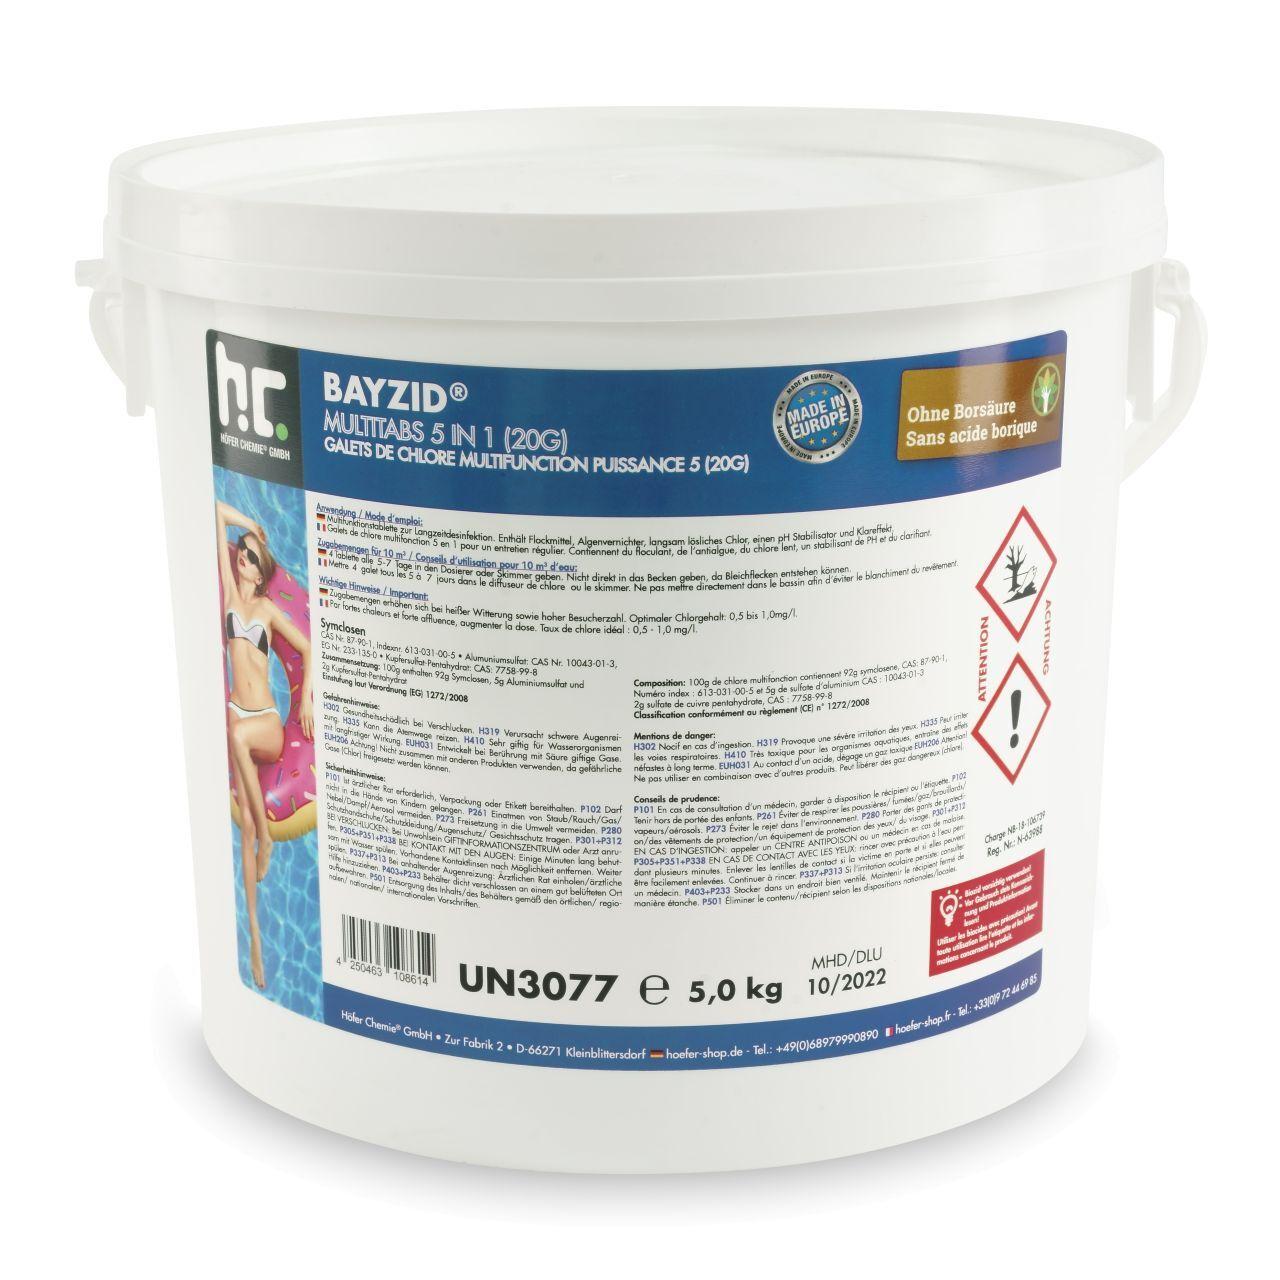 BAYZID 20 kg Bayzid® Pastilles de chlore multifonction (20g) (4 x 5 kg)